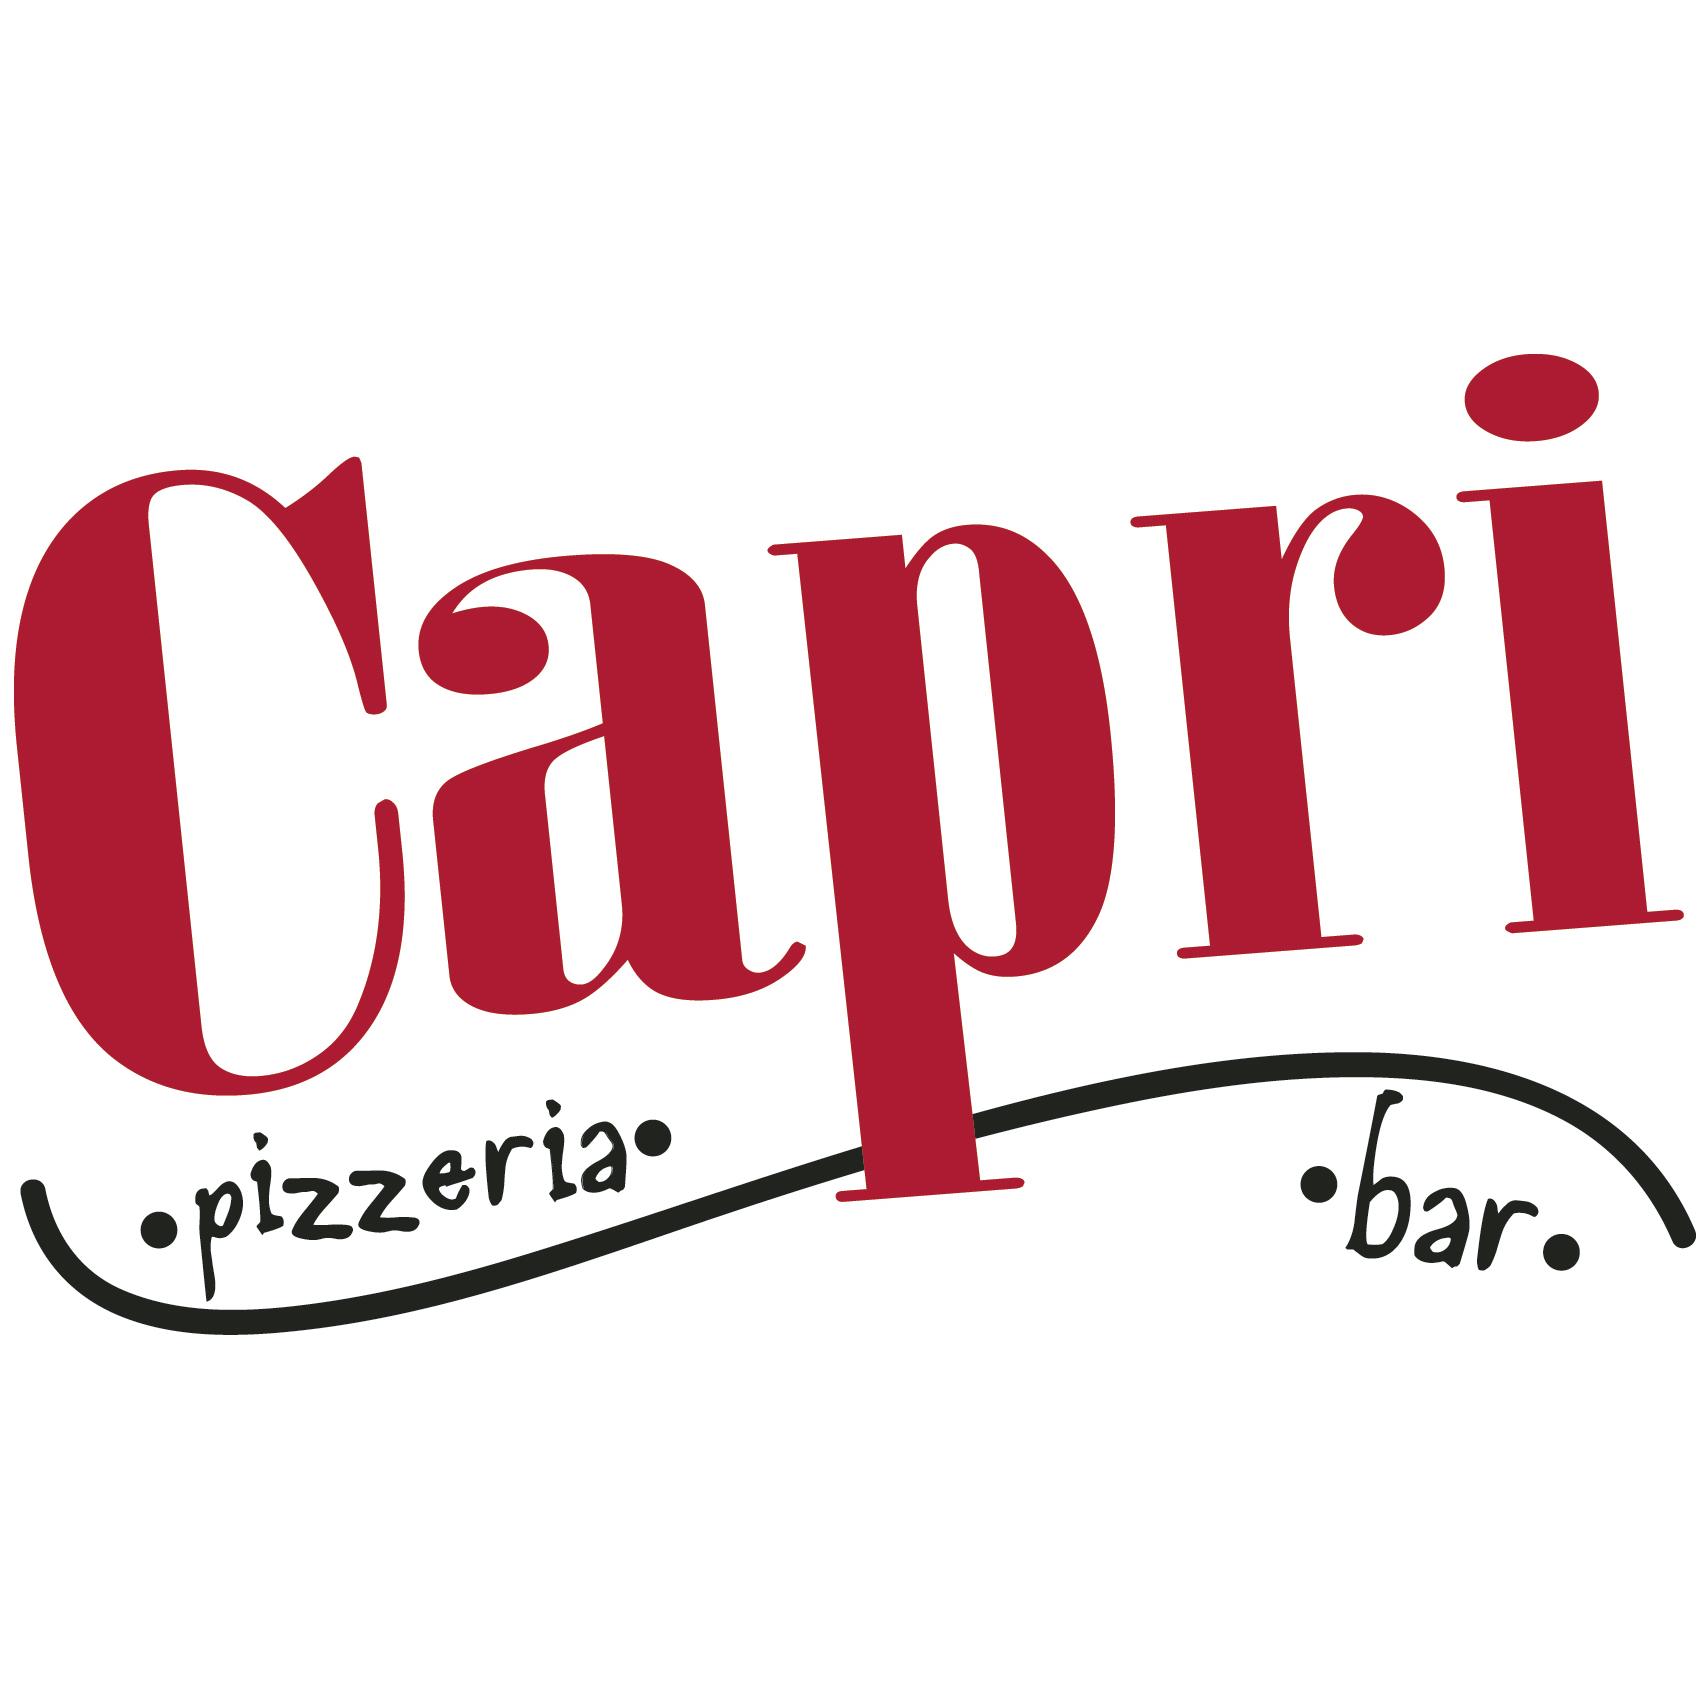 Capri Pizza and Bar